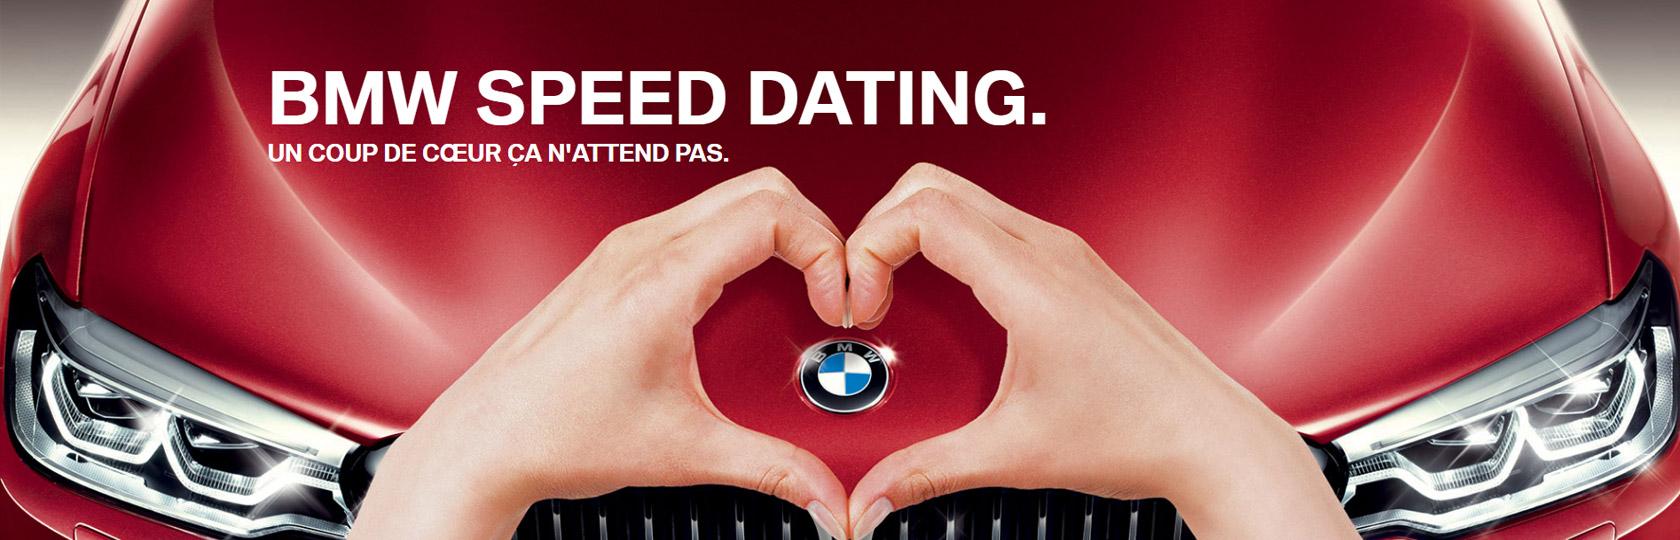 Formulaire nopeus dating